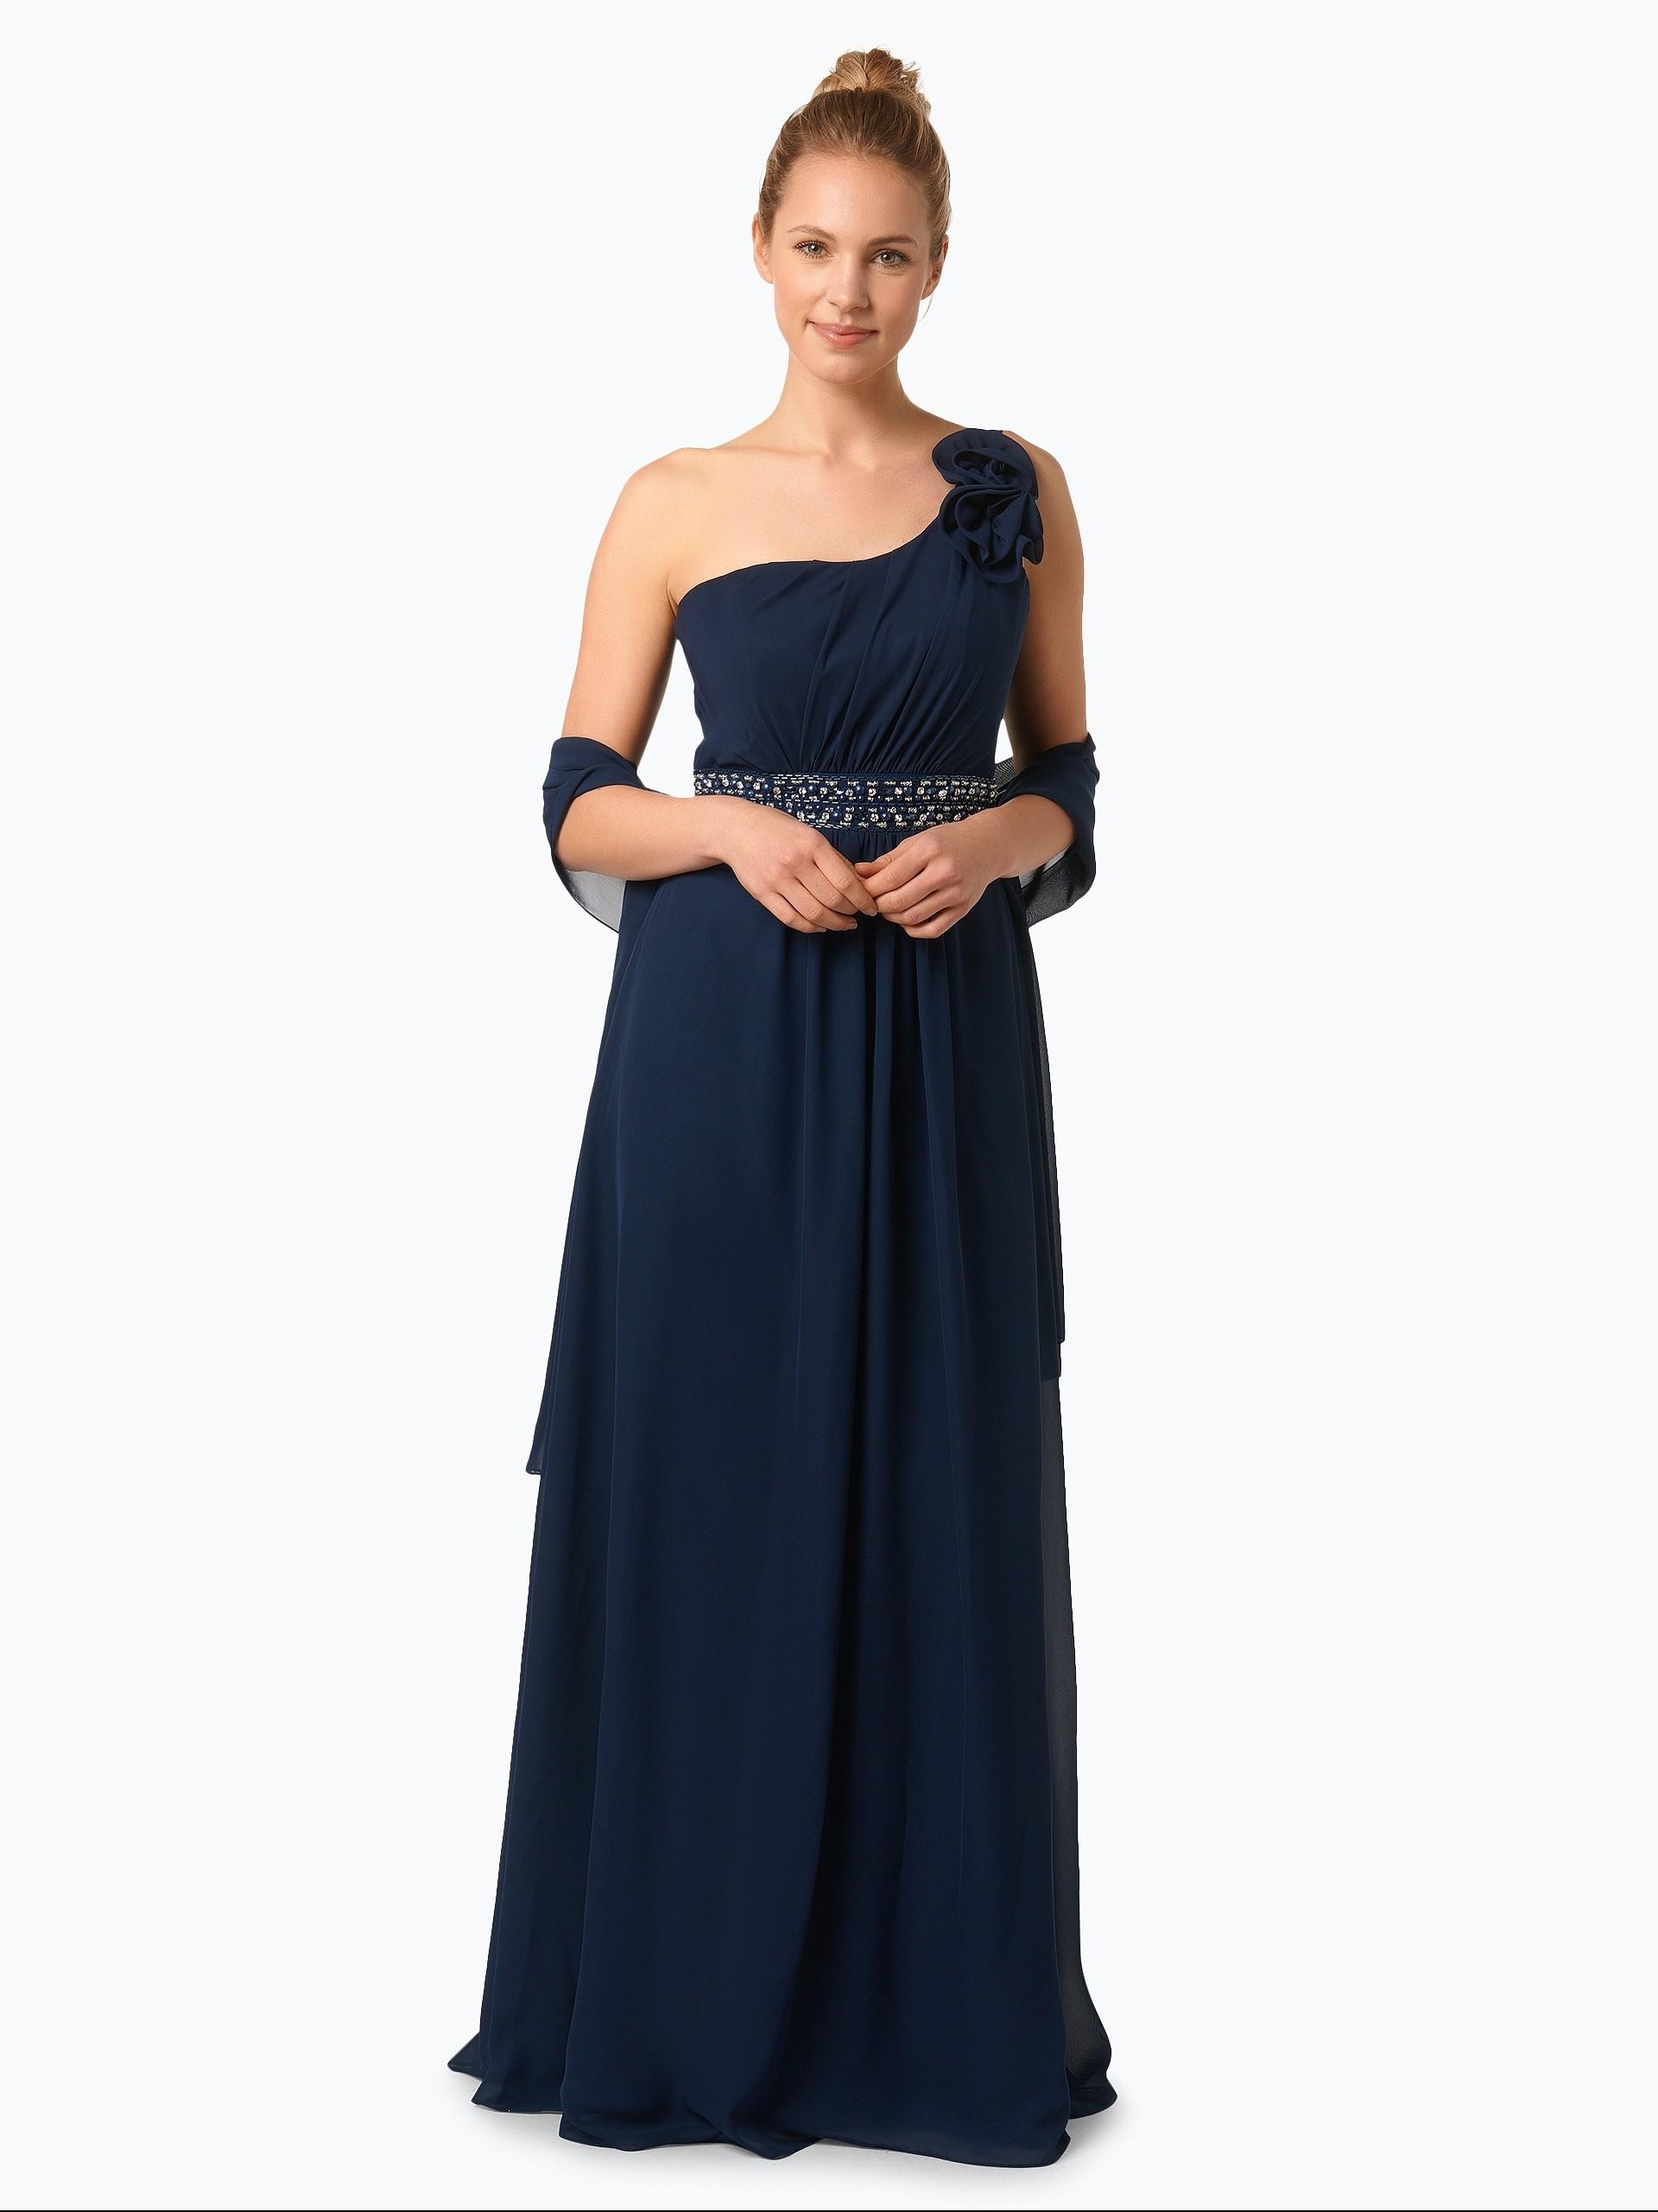 13 Top Fashion Abendkleider Bester Preis13 Großartig Fashion Abendkleider Bester Preis